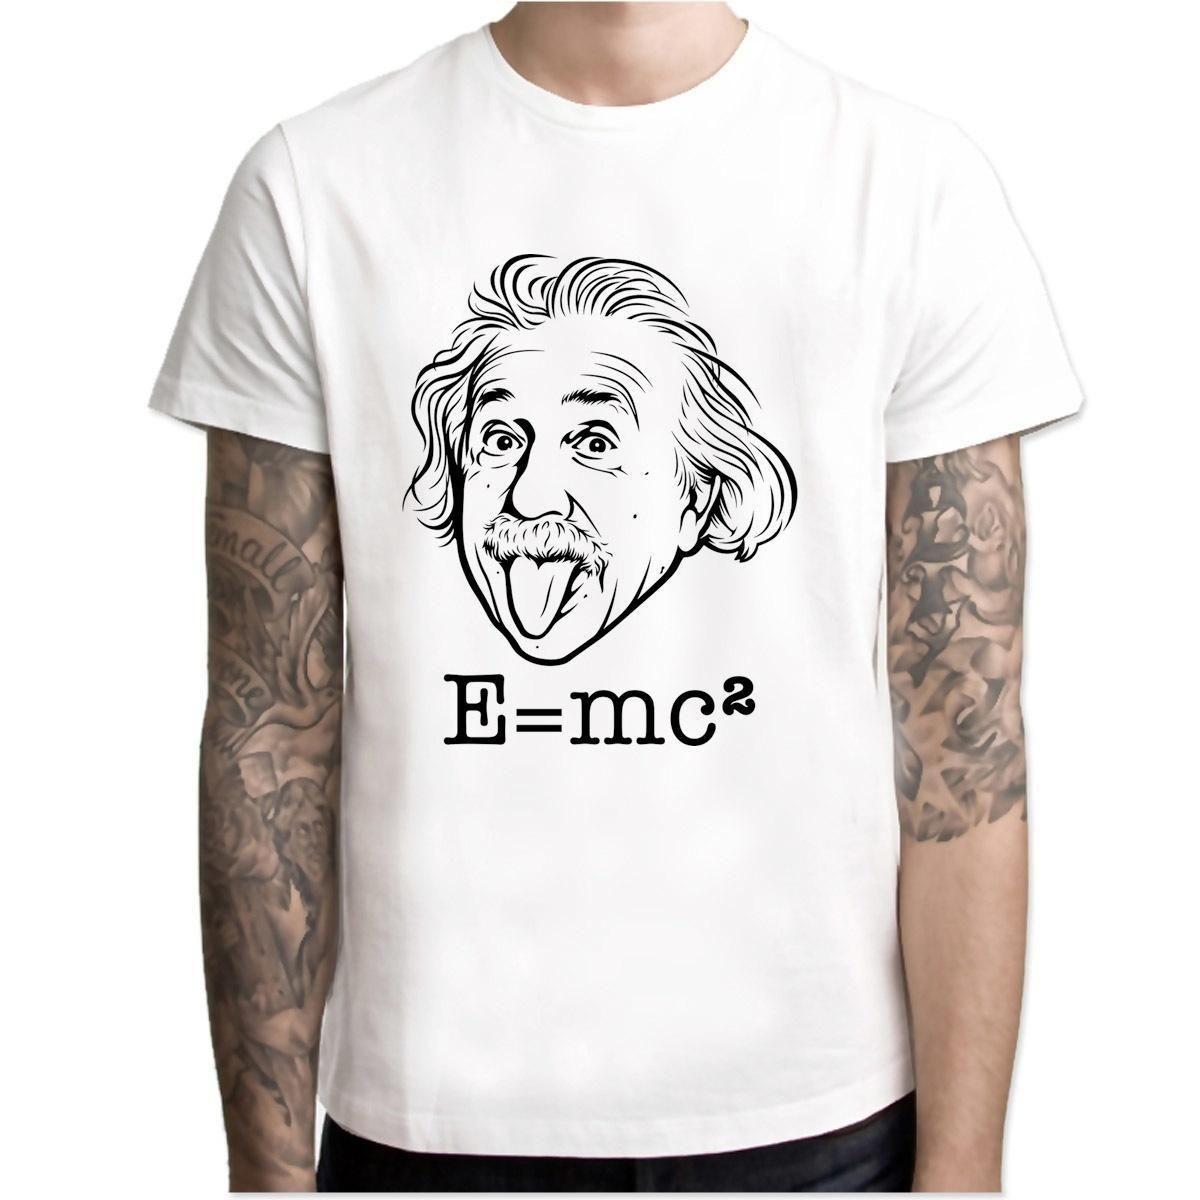 fb94c6696 Compre Albert Einstein E MC2 Genius T Camisa Hip Hop Estilo Novo Design  Original T Shirt Legal Moda Men Tshirt Cor M7R1272 De Amesion89